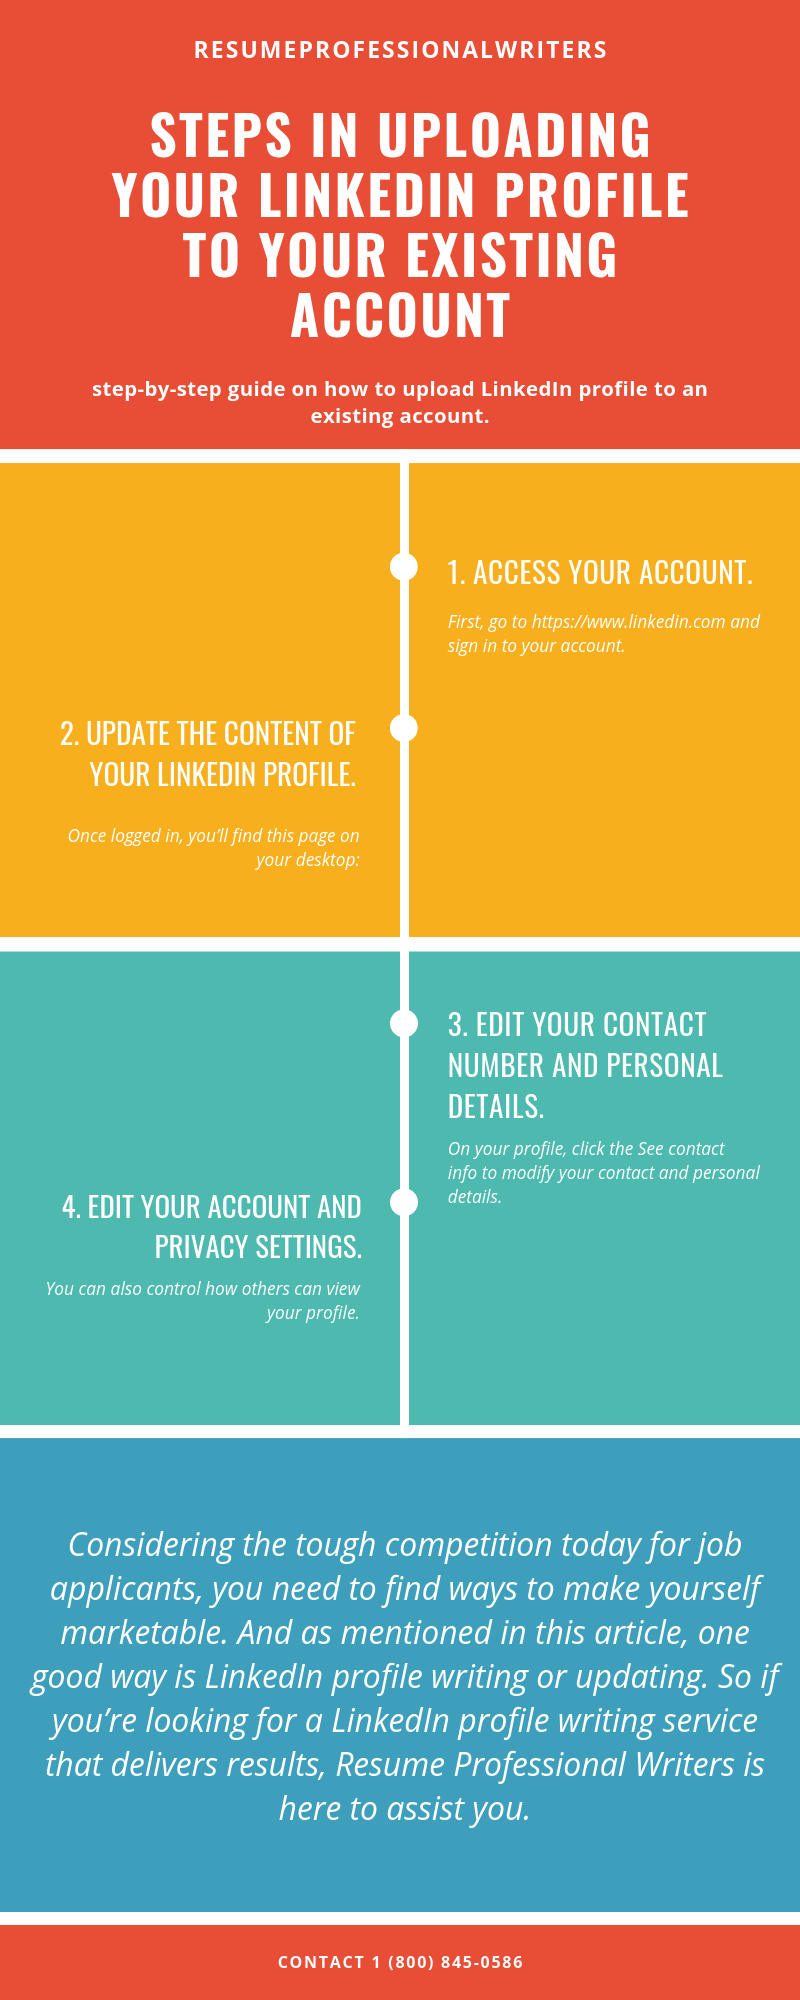 LinkedIn Profile StepbyStep Guide to Help Improve Your